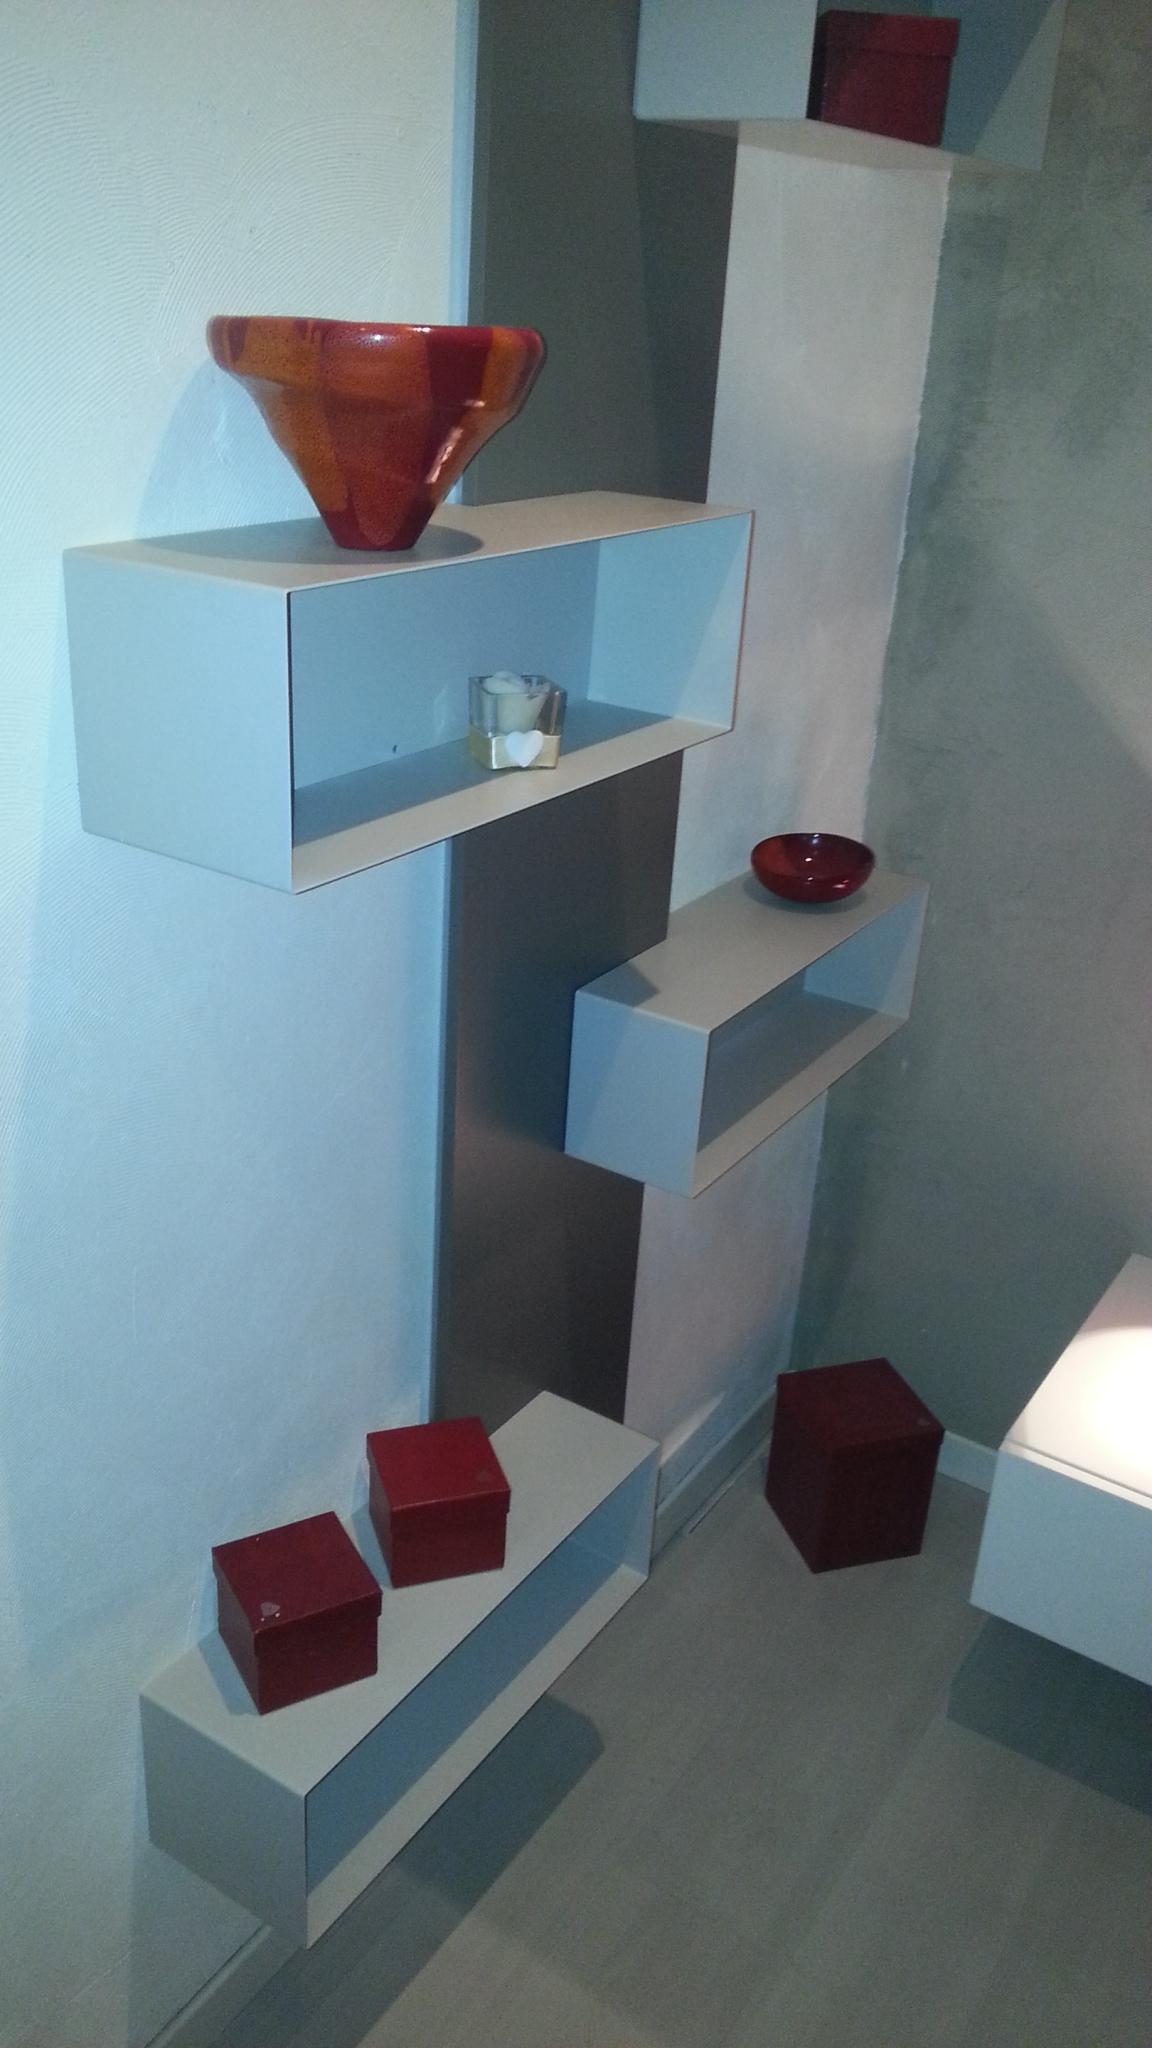 camere da letto outlet ~ logisting.com = varie forme di mobili ... - Outlet Camera Da Letto